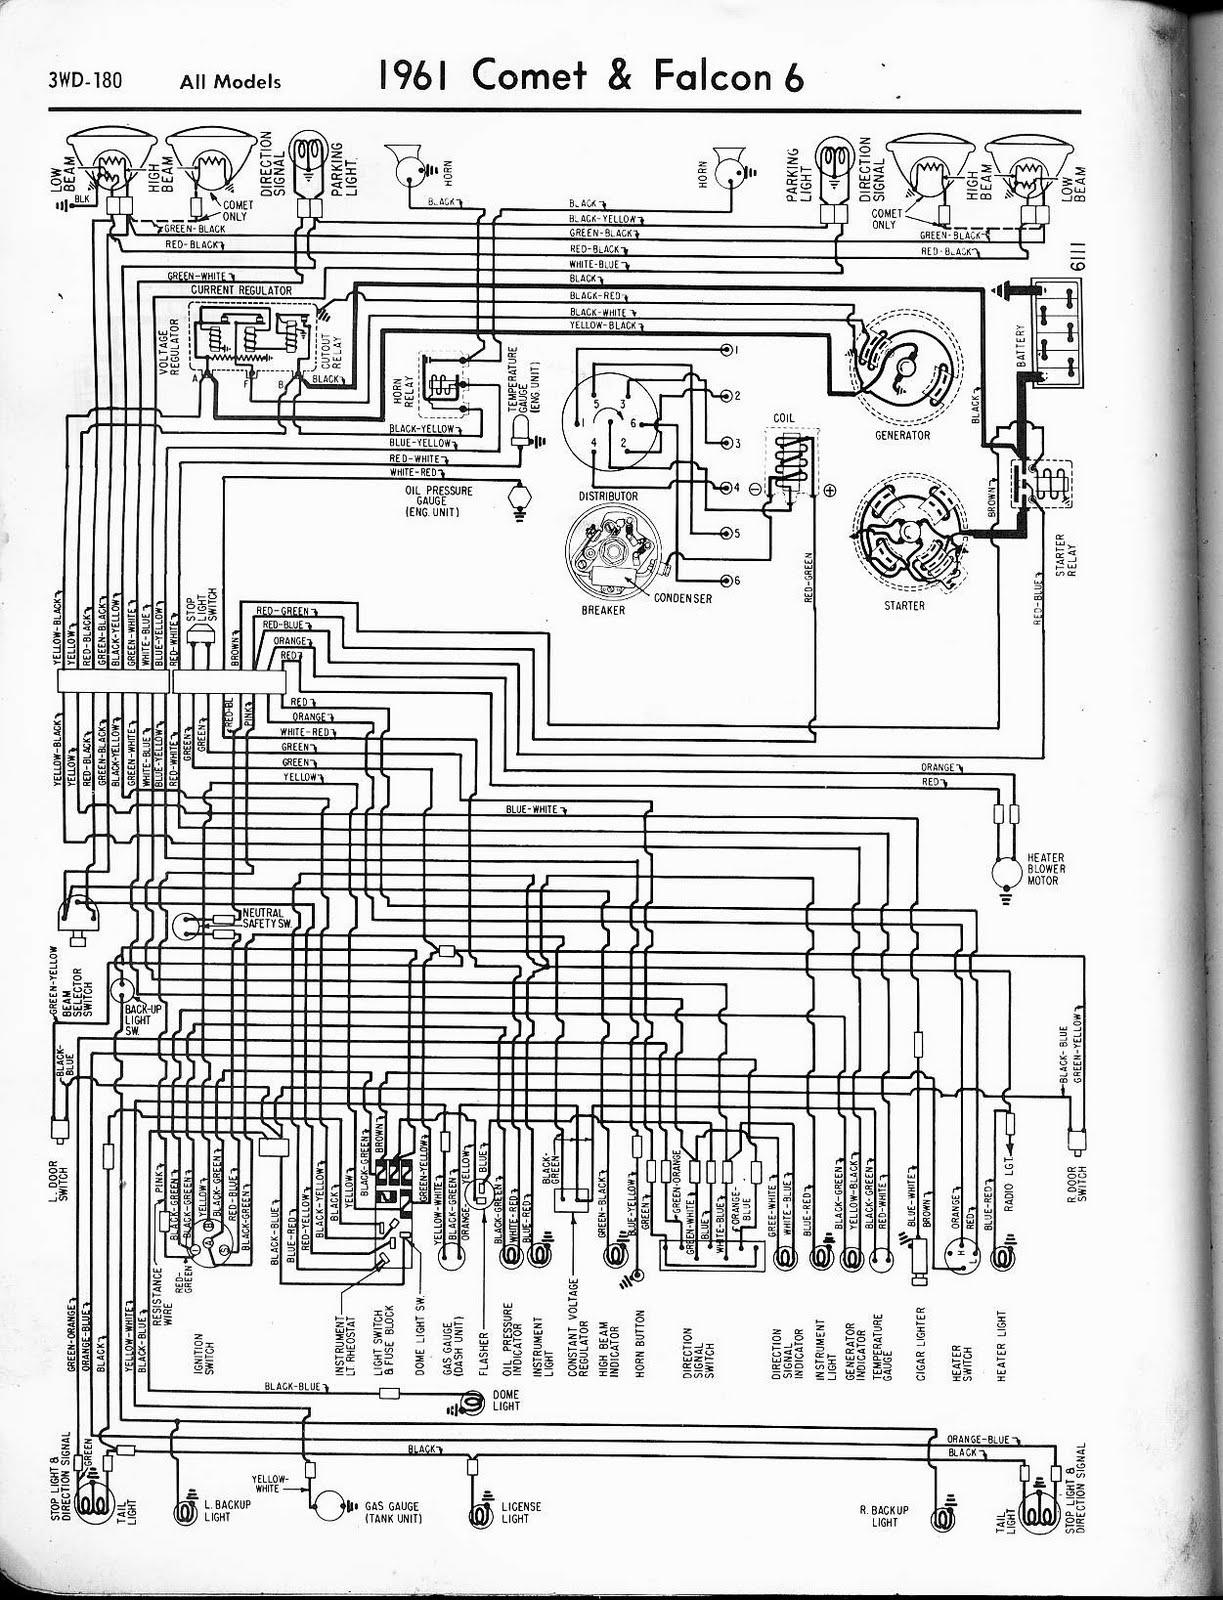 Fabulous Xf Falcon Alternator Wiring Diagram Basic Electronics Wiring Diagram Wiring Cloud Xortanetembamohammedshrineorg